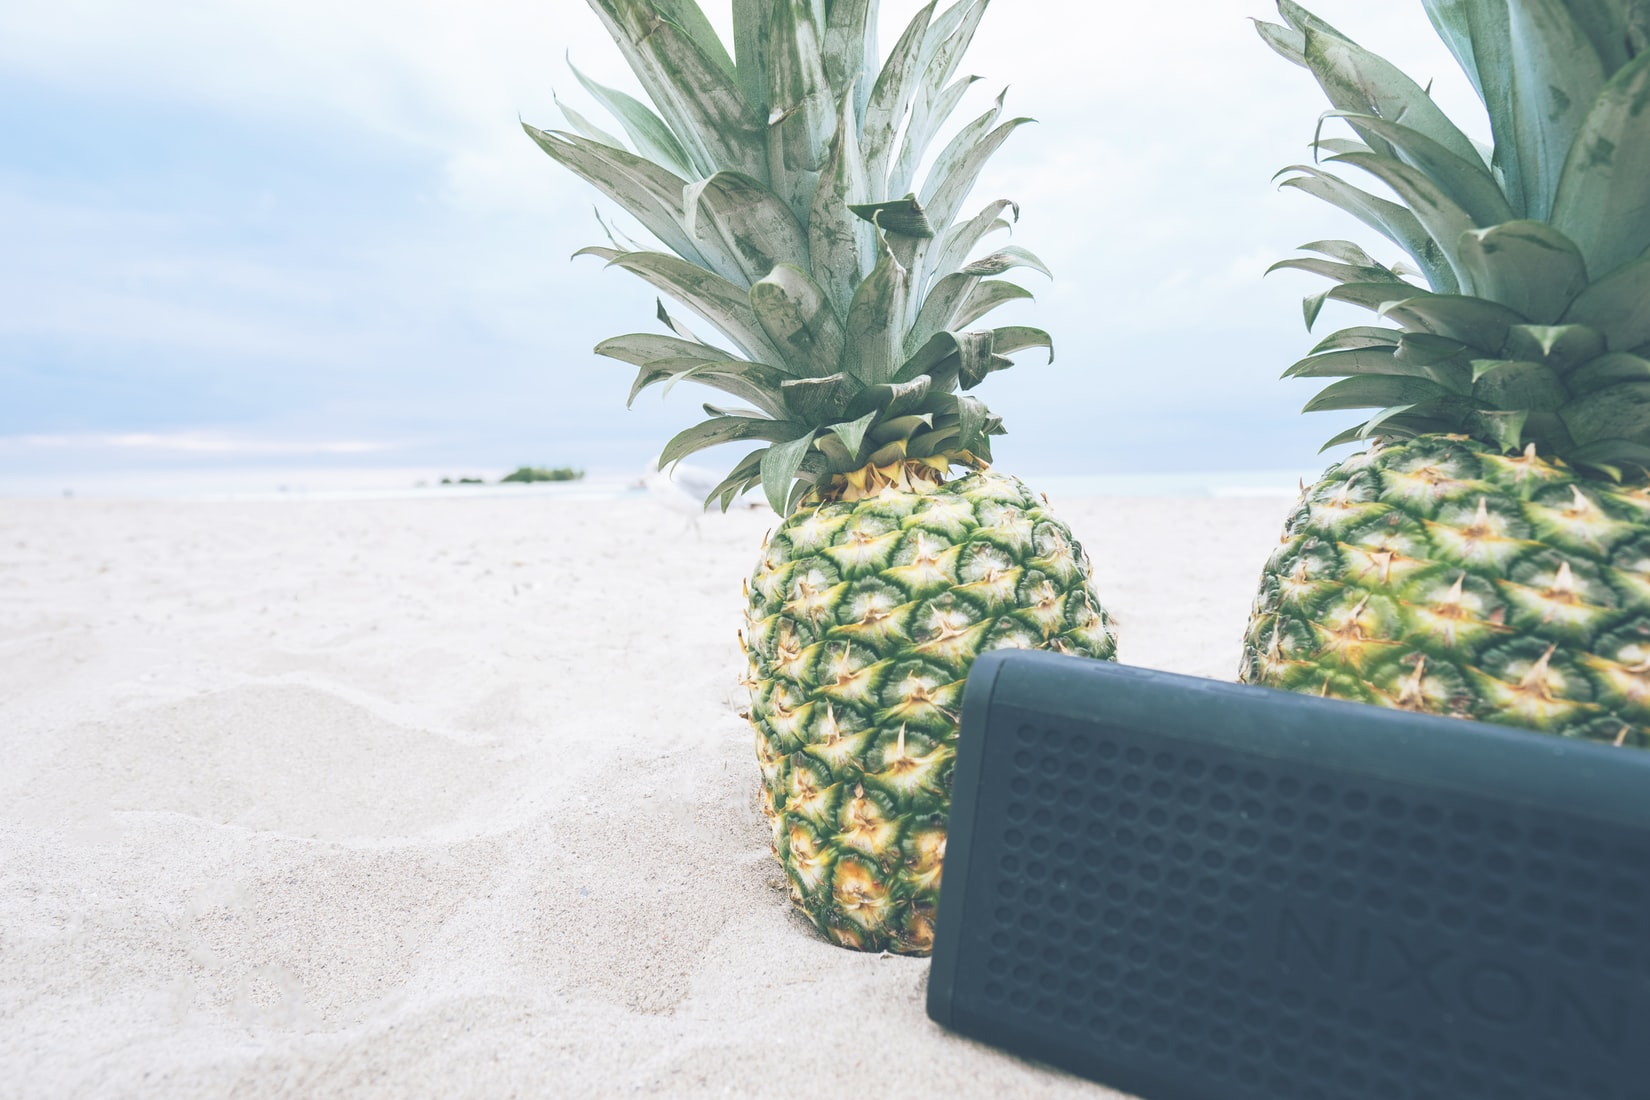 Black portable Nixon speaker next to two pineapples on sand